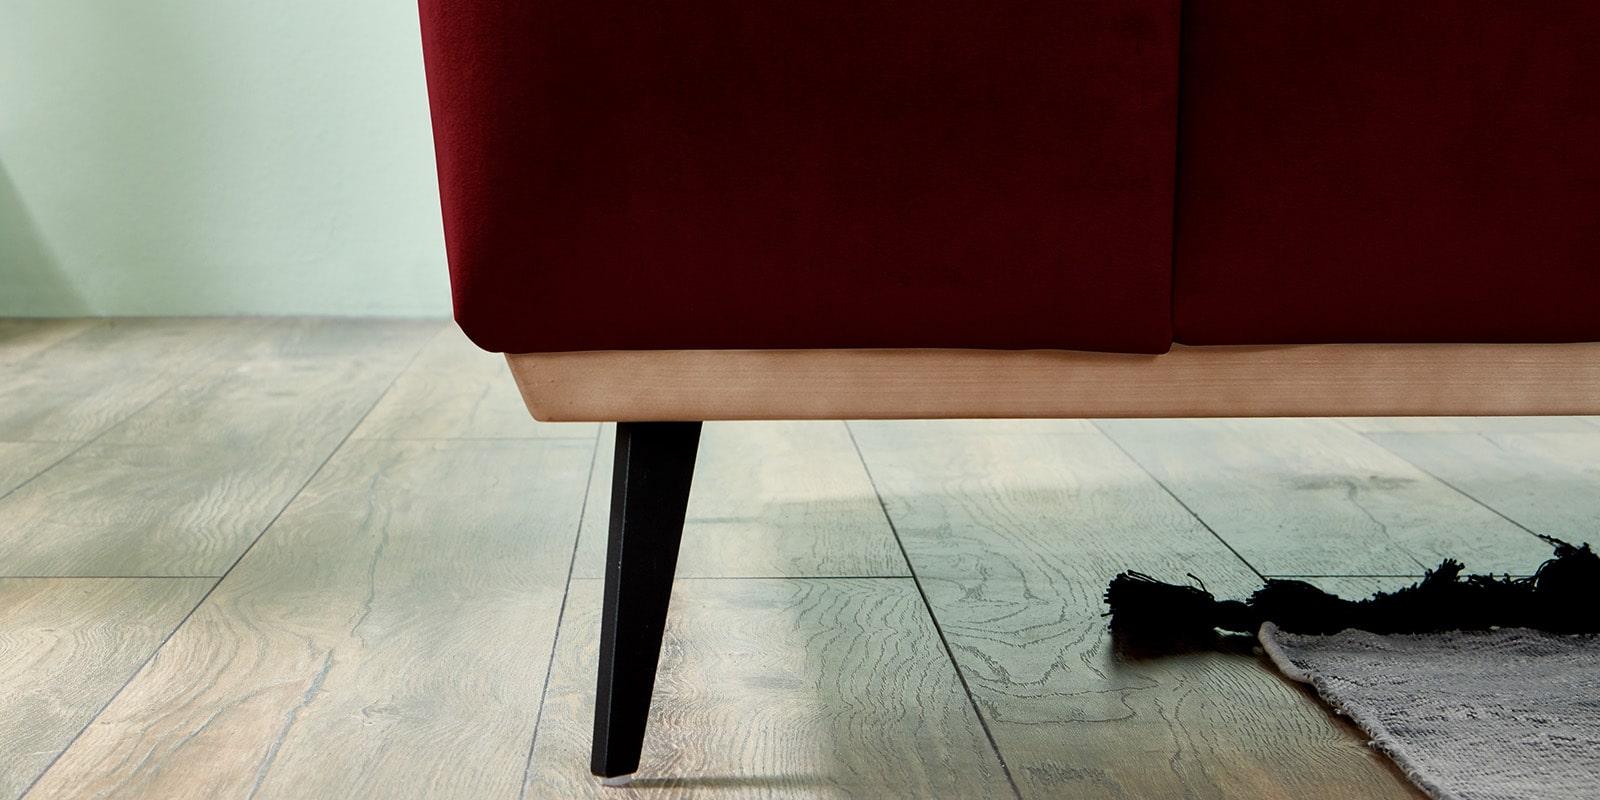 Moebella24 - Ecksofa - mit - Ottomane -Barcelona - Samt - Rot - Skandinavisches - Punto - cavallo - Nähte - Elegante - Füße - Detailaufnahme